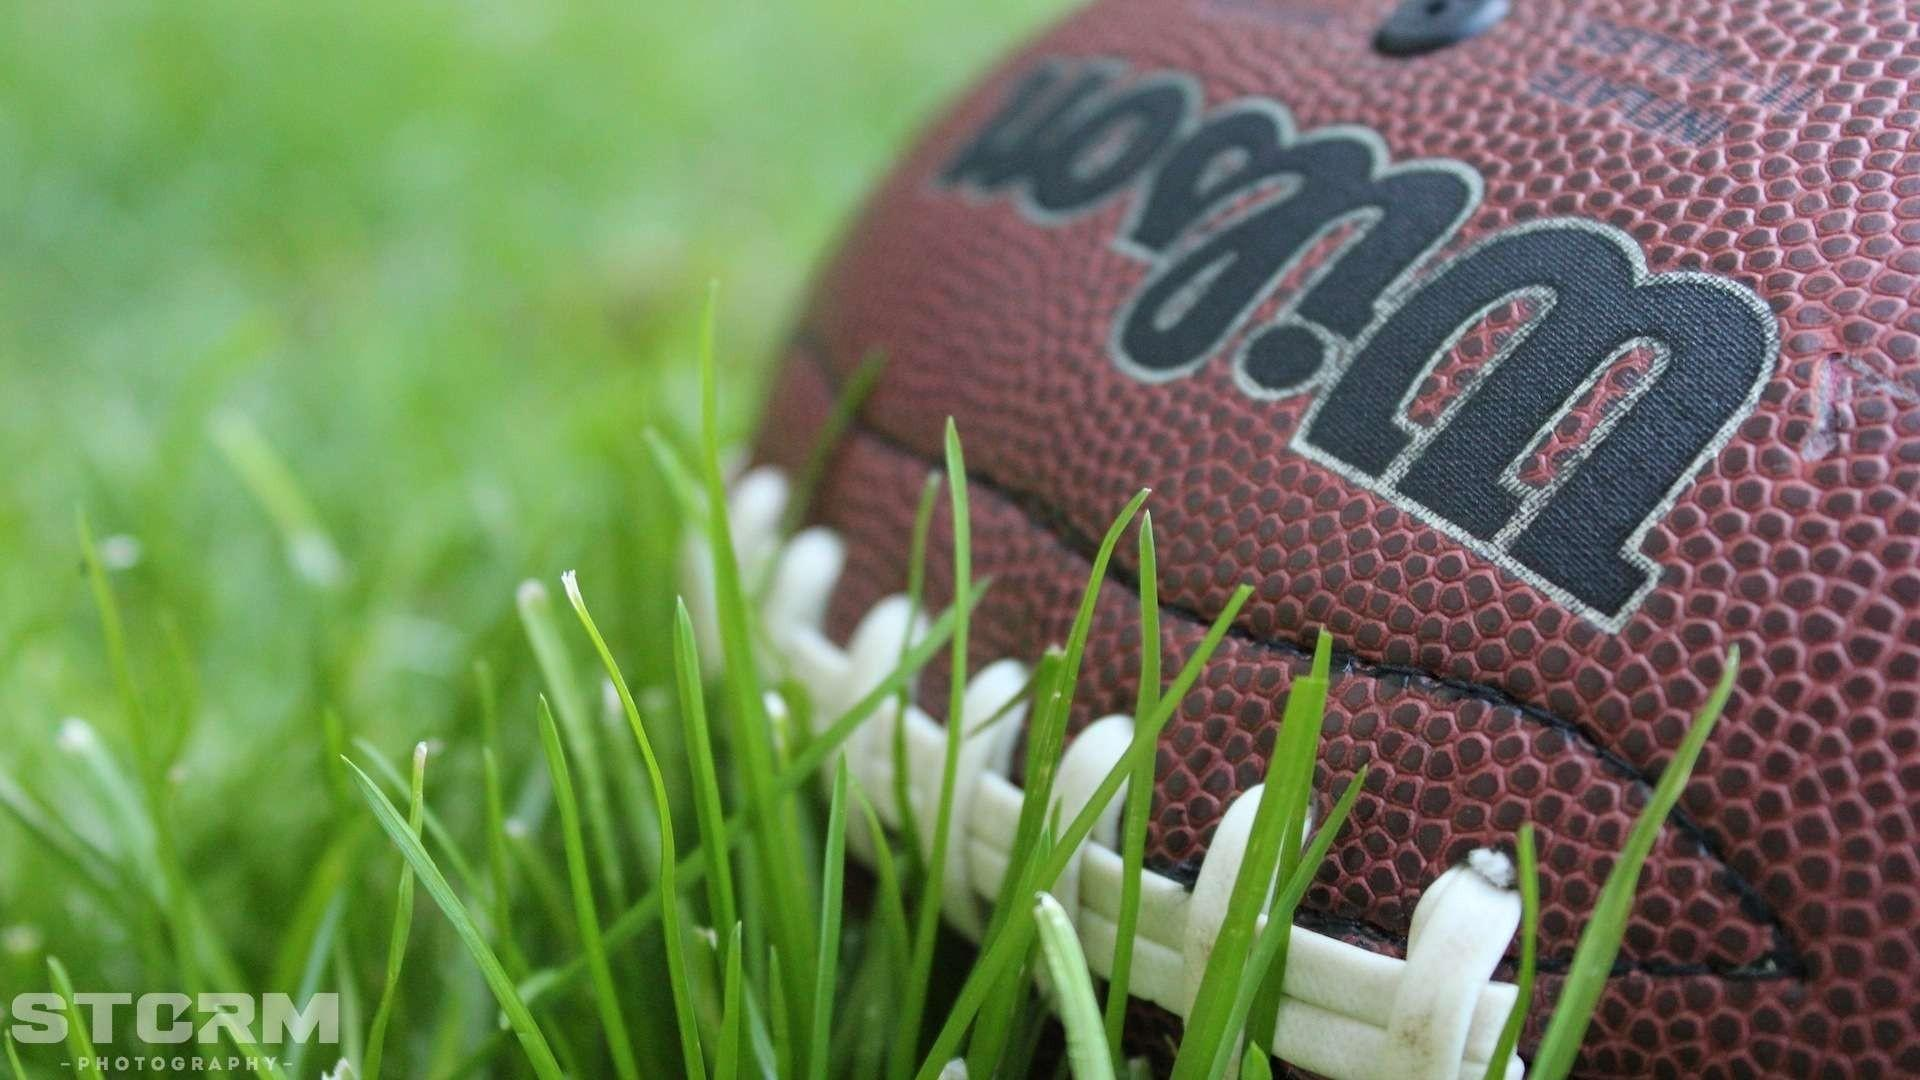 American Football Iphone Wallpapers: American Football HD Wallpapers